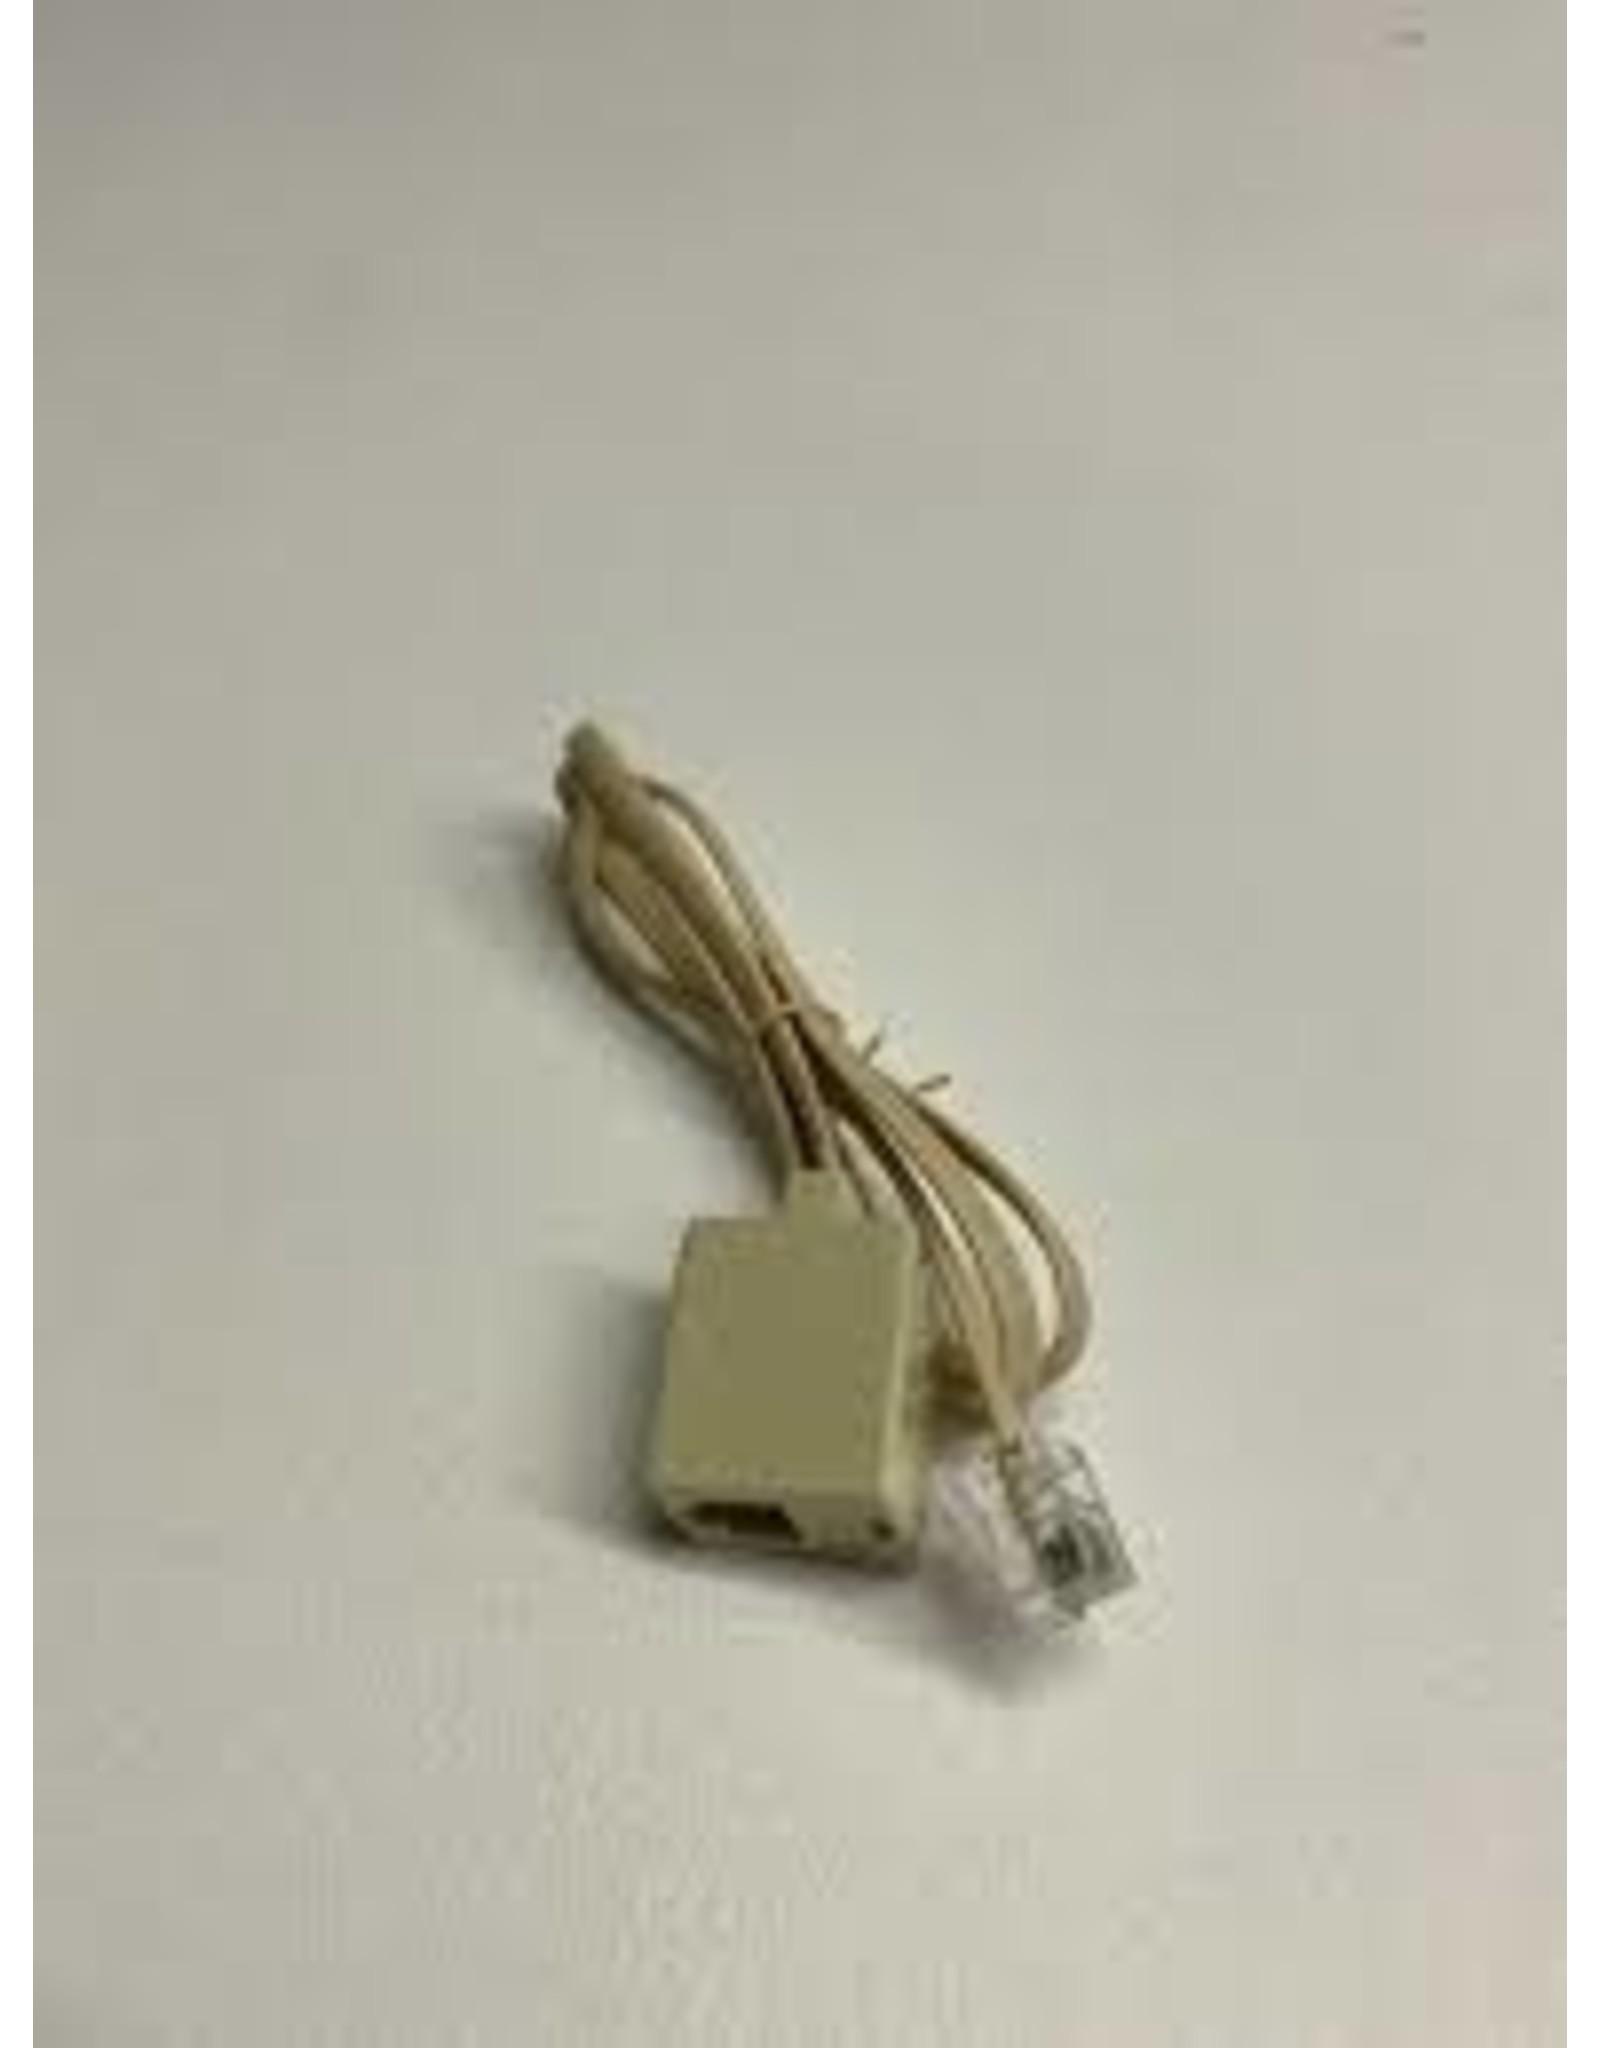 Titan 704-548 Transducer Jumper